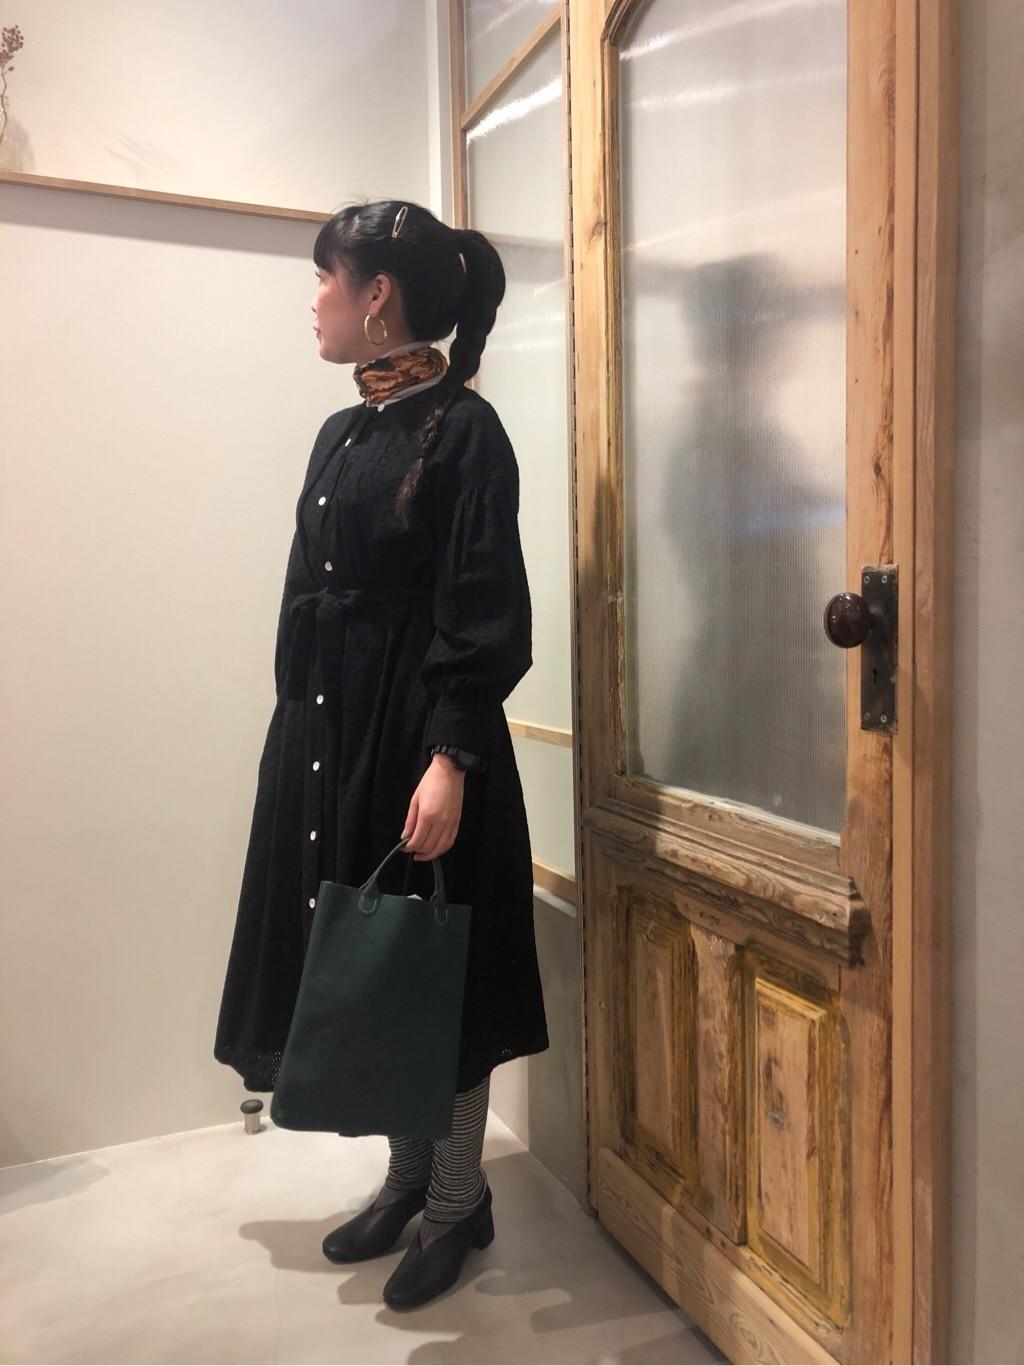 AMB SHOP bulle de savon FLAT AMB メルサ自由が丘 身長:157cm 2019.12.11